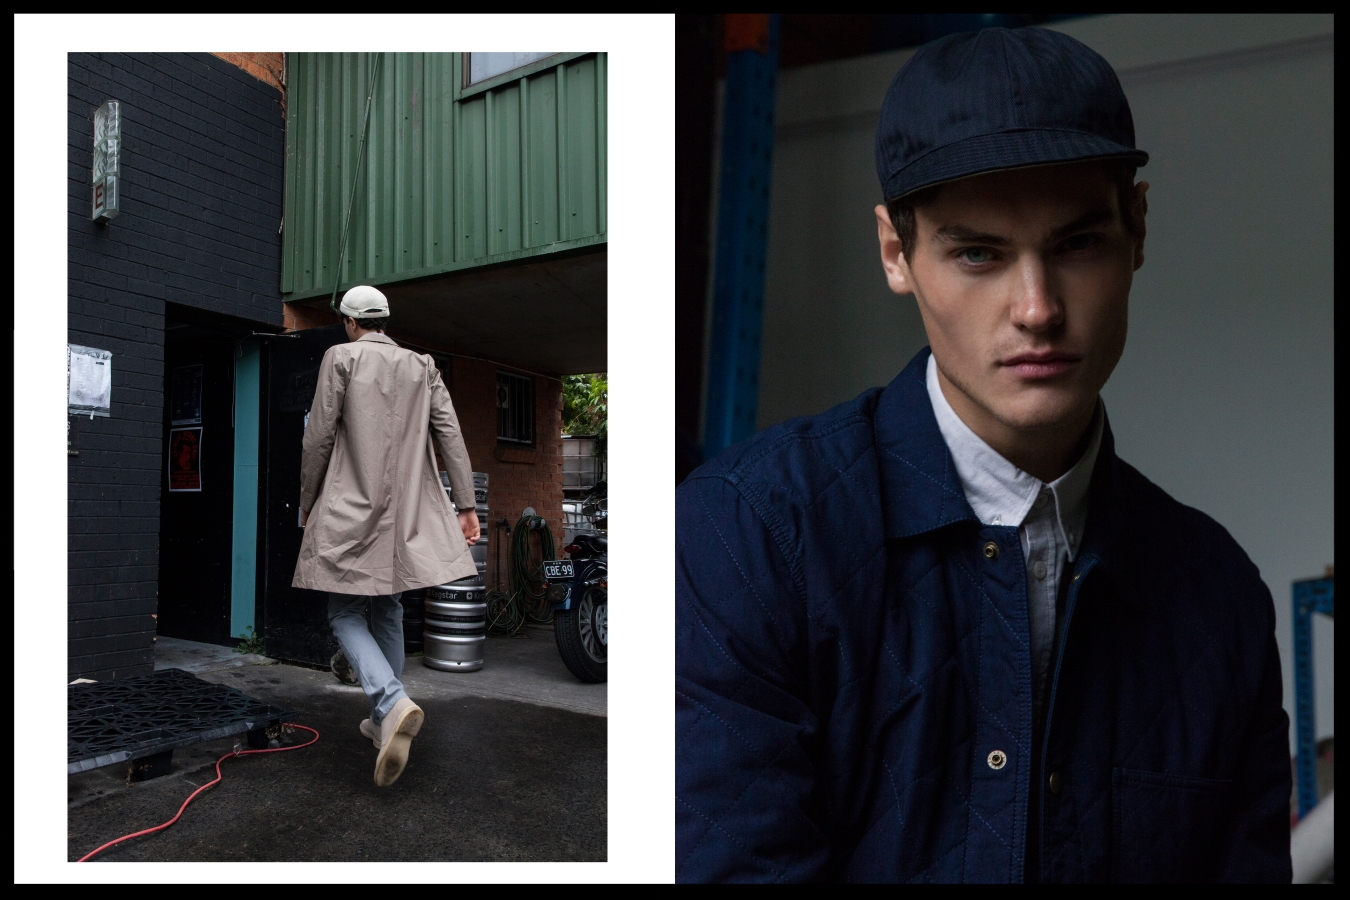 Left: Stutterheim mac, APC jeans, Clarks boots, stylist's own hat, Right: APC jacket, Fillipa K shirt, Troy O'Shea hat